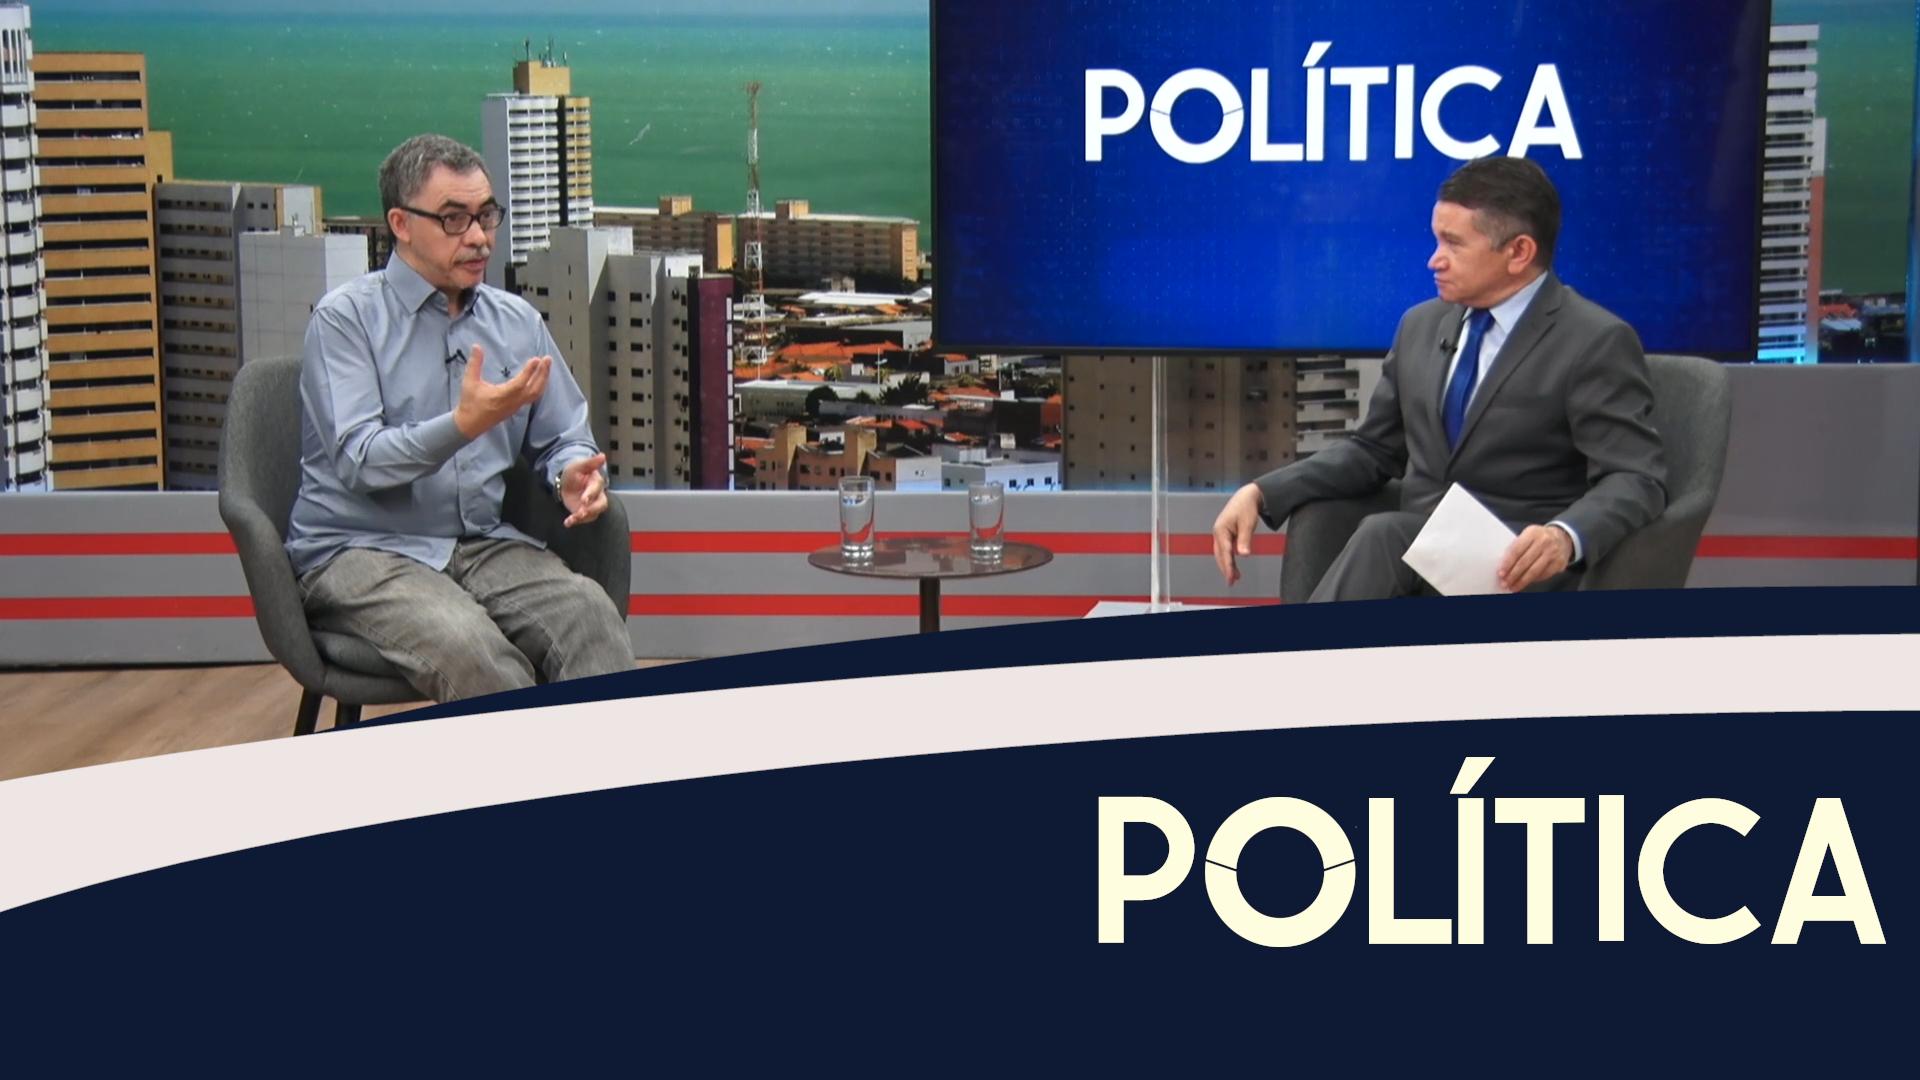 Política entrevista Claudio Teran, Jornalista e Analista político